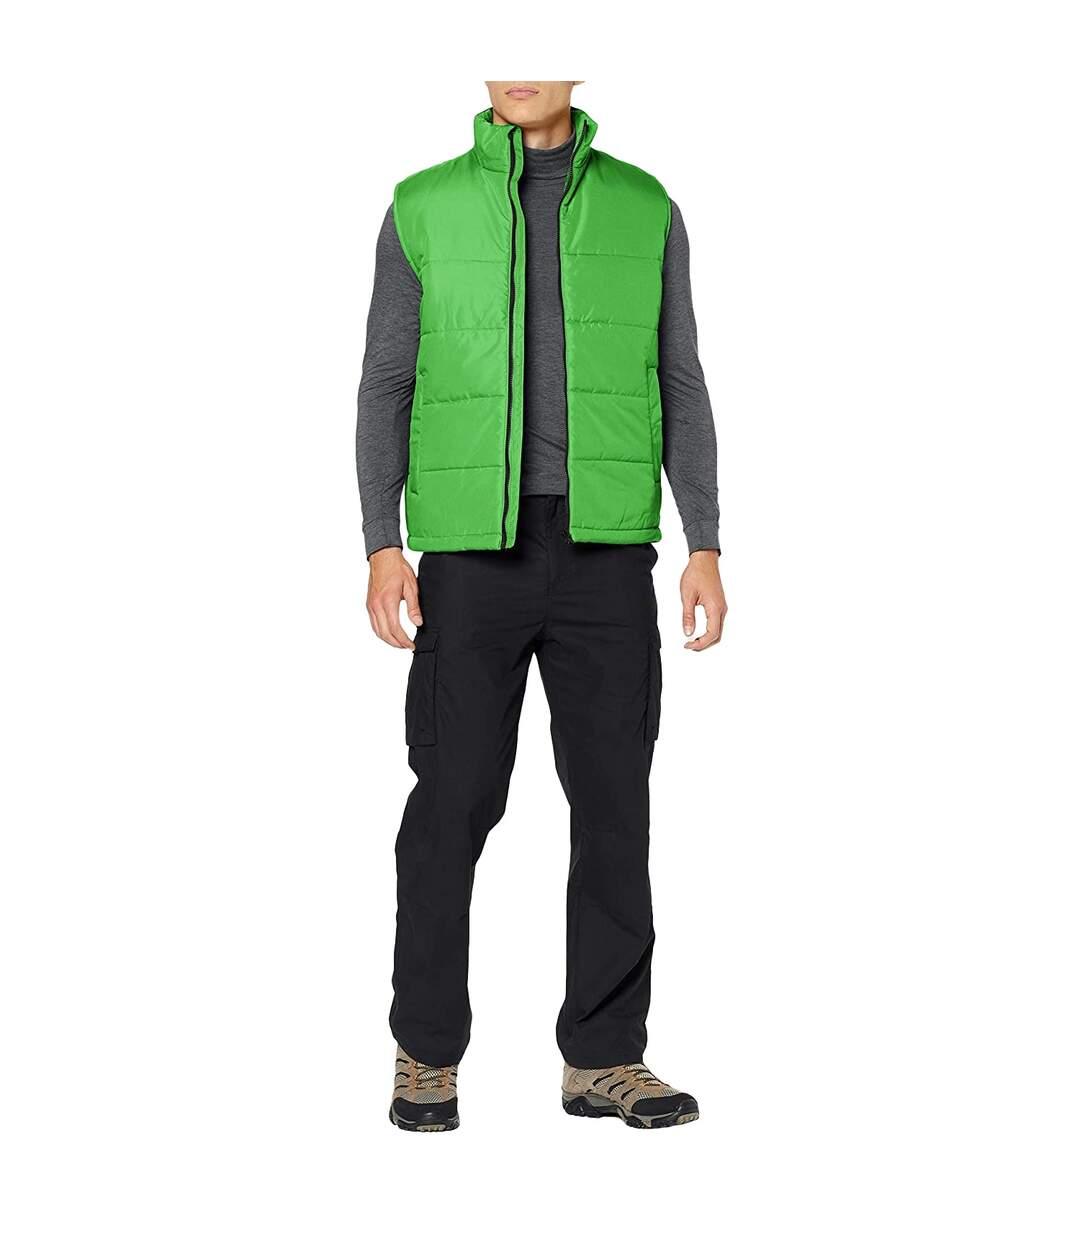 Regatta Mens Access Insulated Bodywarmer (Extreme Green/Black) - UTRG3564